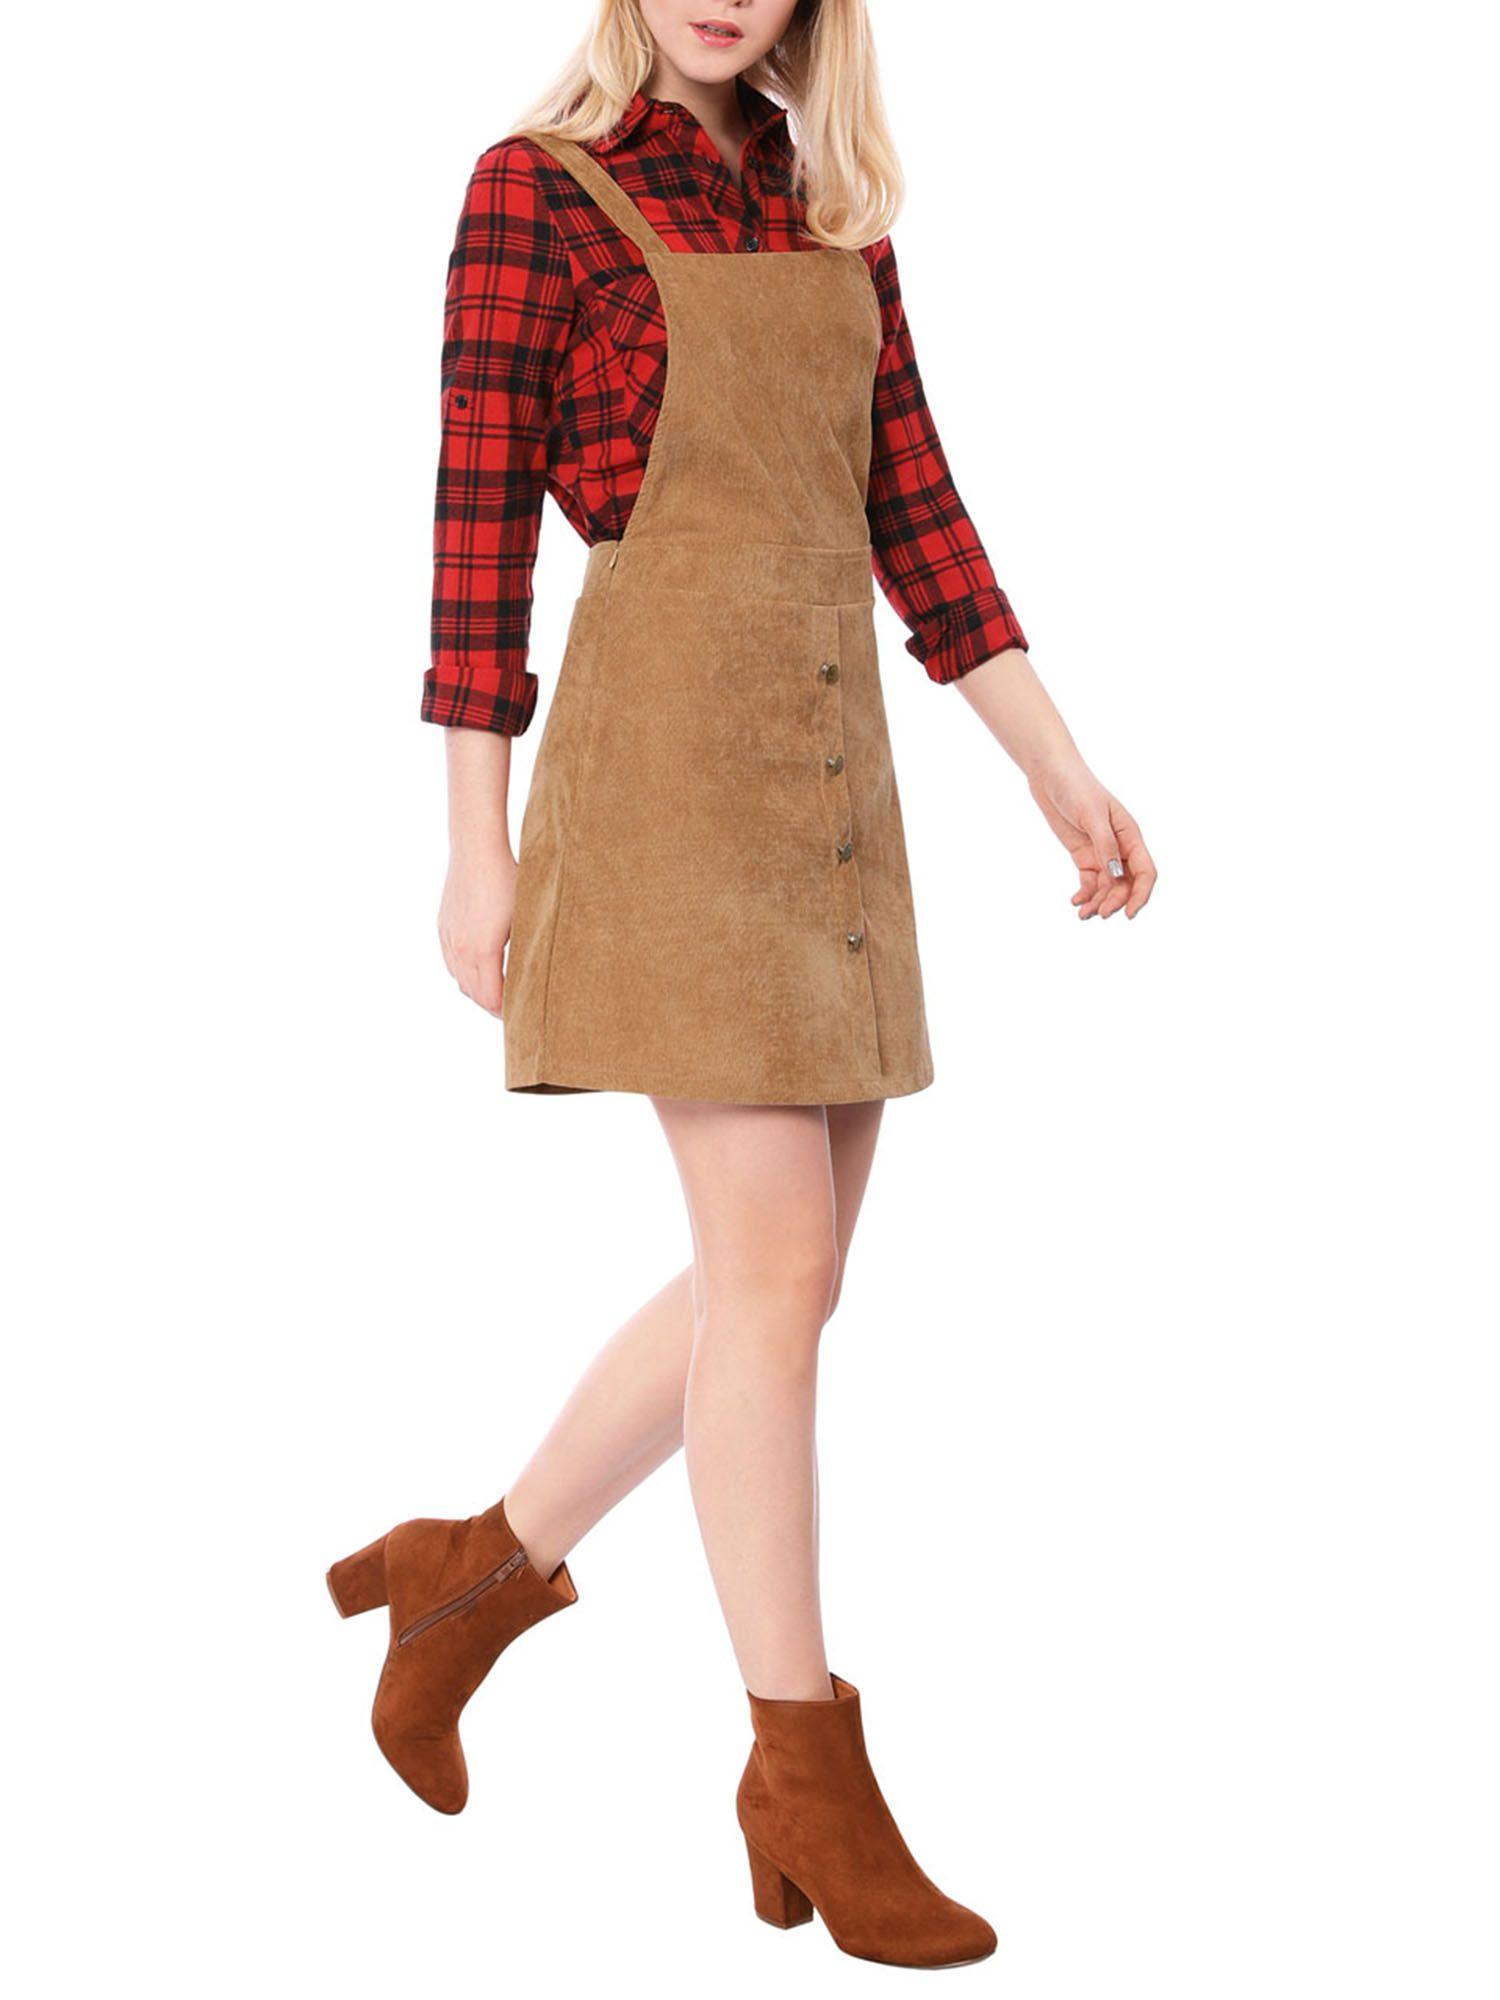 Women S A Line Corduroy Button Decor Suspender Overall Skirt Dress Ad Corduroy Sponsored Button Wo Casual Dresses For Teens Overall Skirt Overall Dress [ 2000 x 1500 Pixel ]